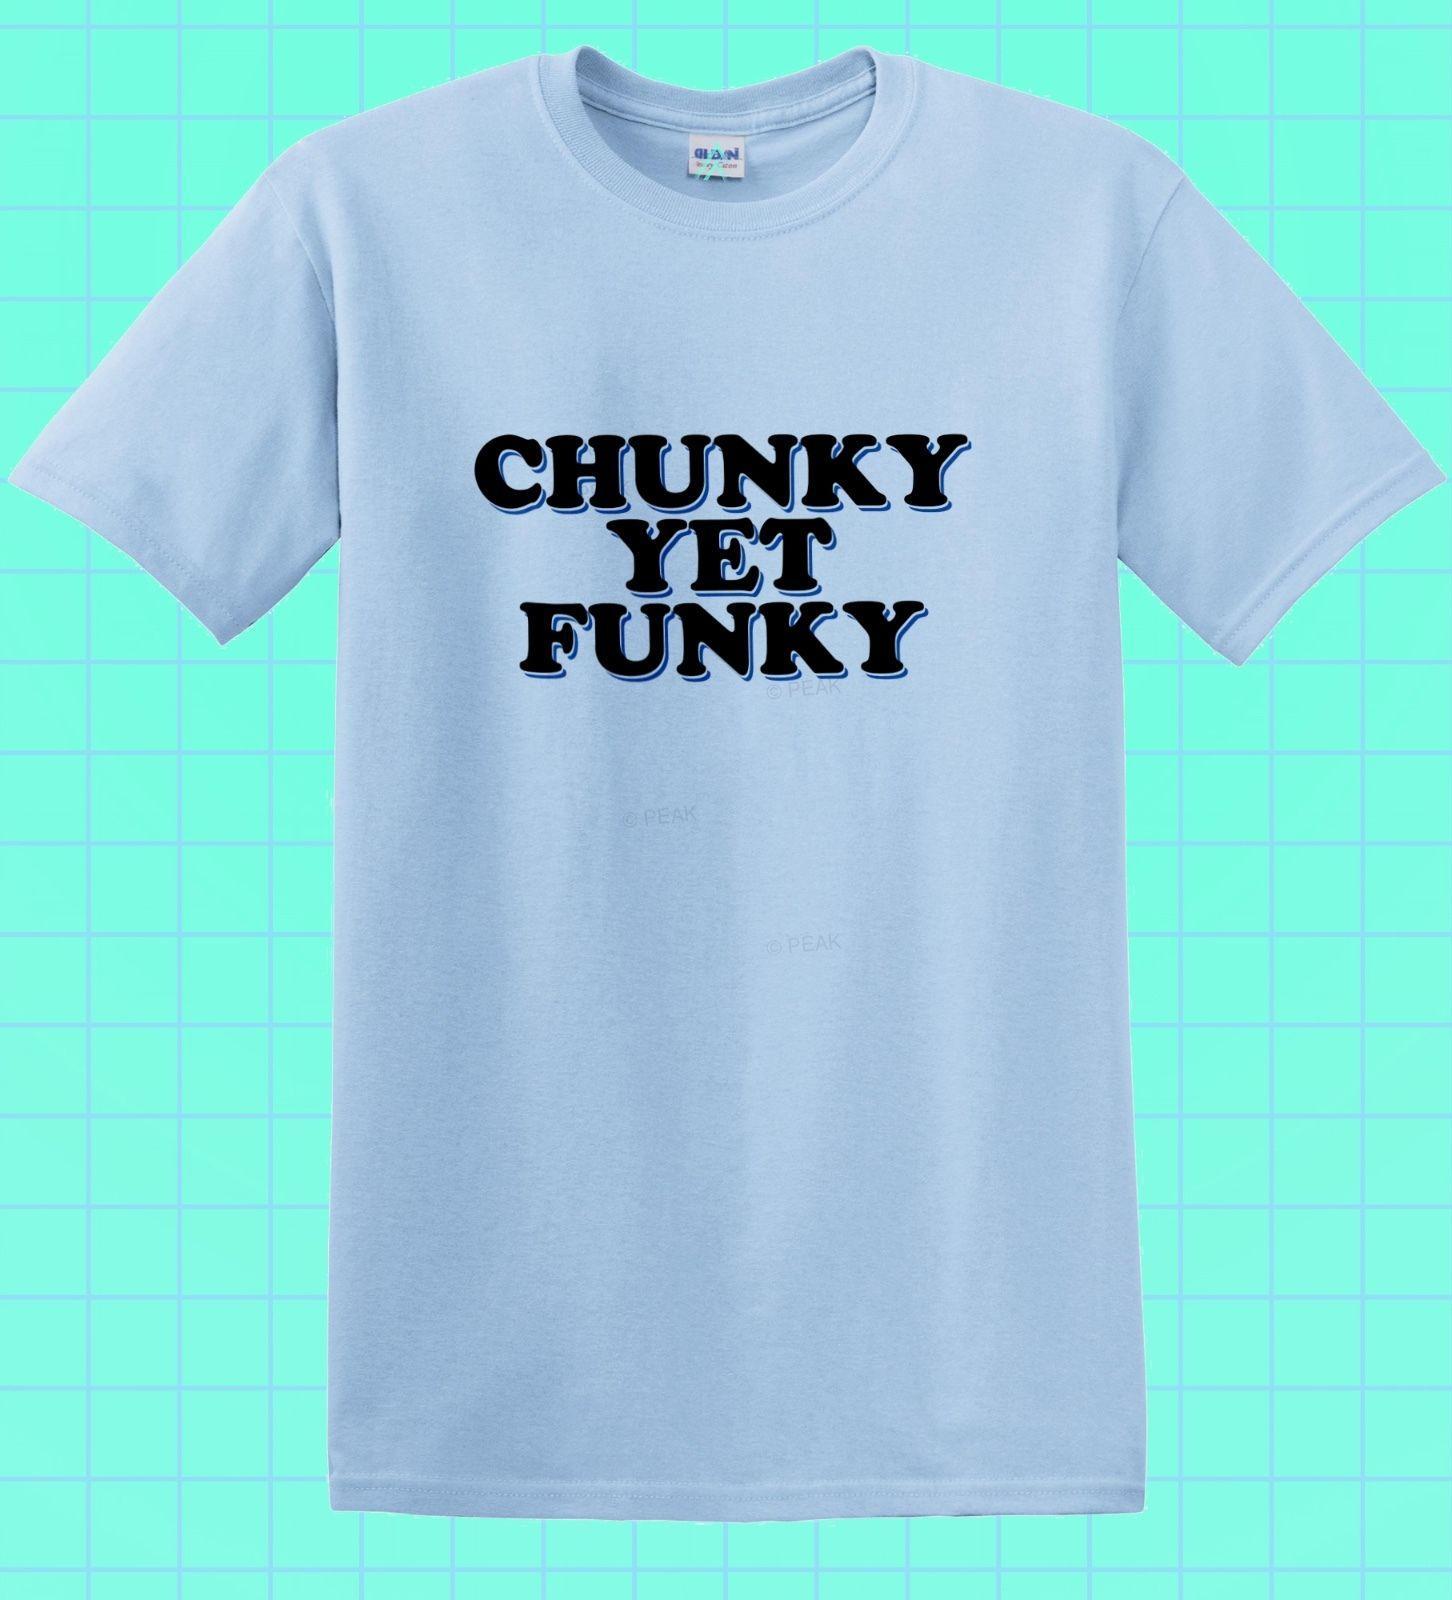 6dd8d50ebbb46 Latrice Funky Chunky T-shirt Royale LGBT Pride Gay Tee Rupaul Drag  Valentina Top Funny free shipping Unisex Casual Tshirt top